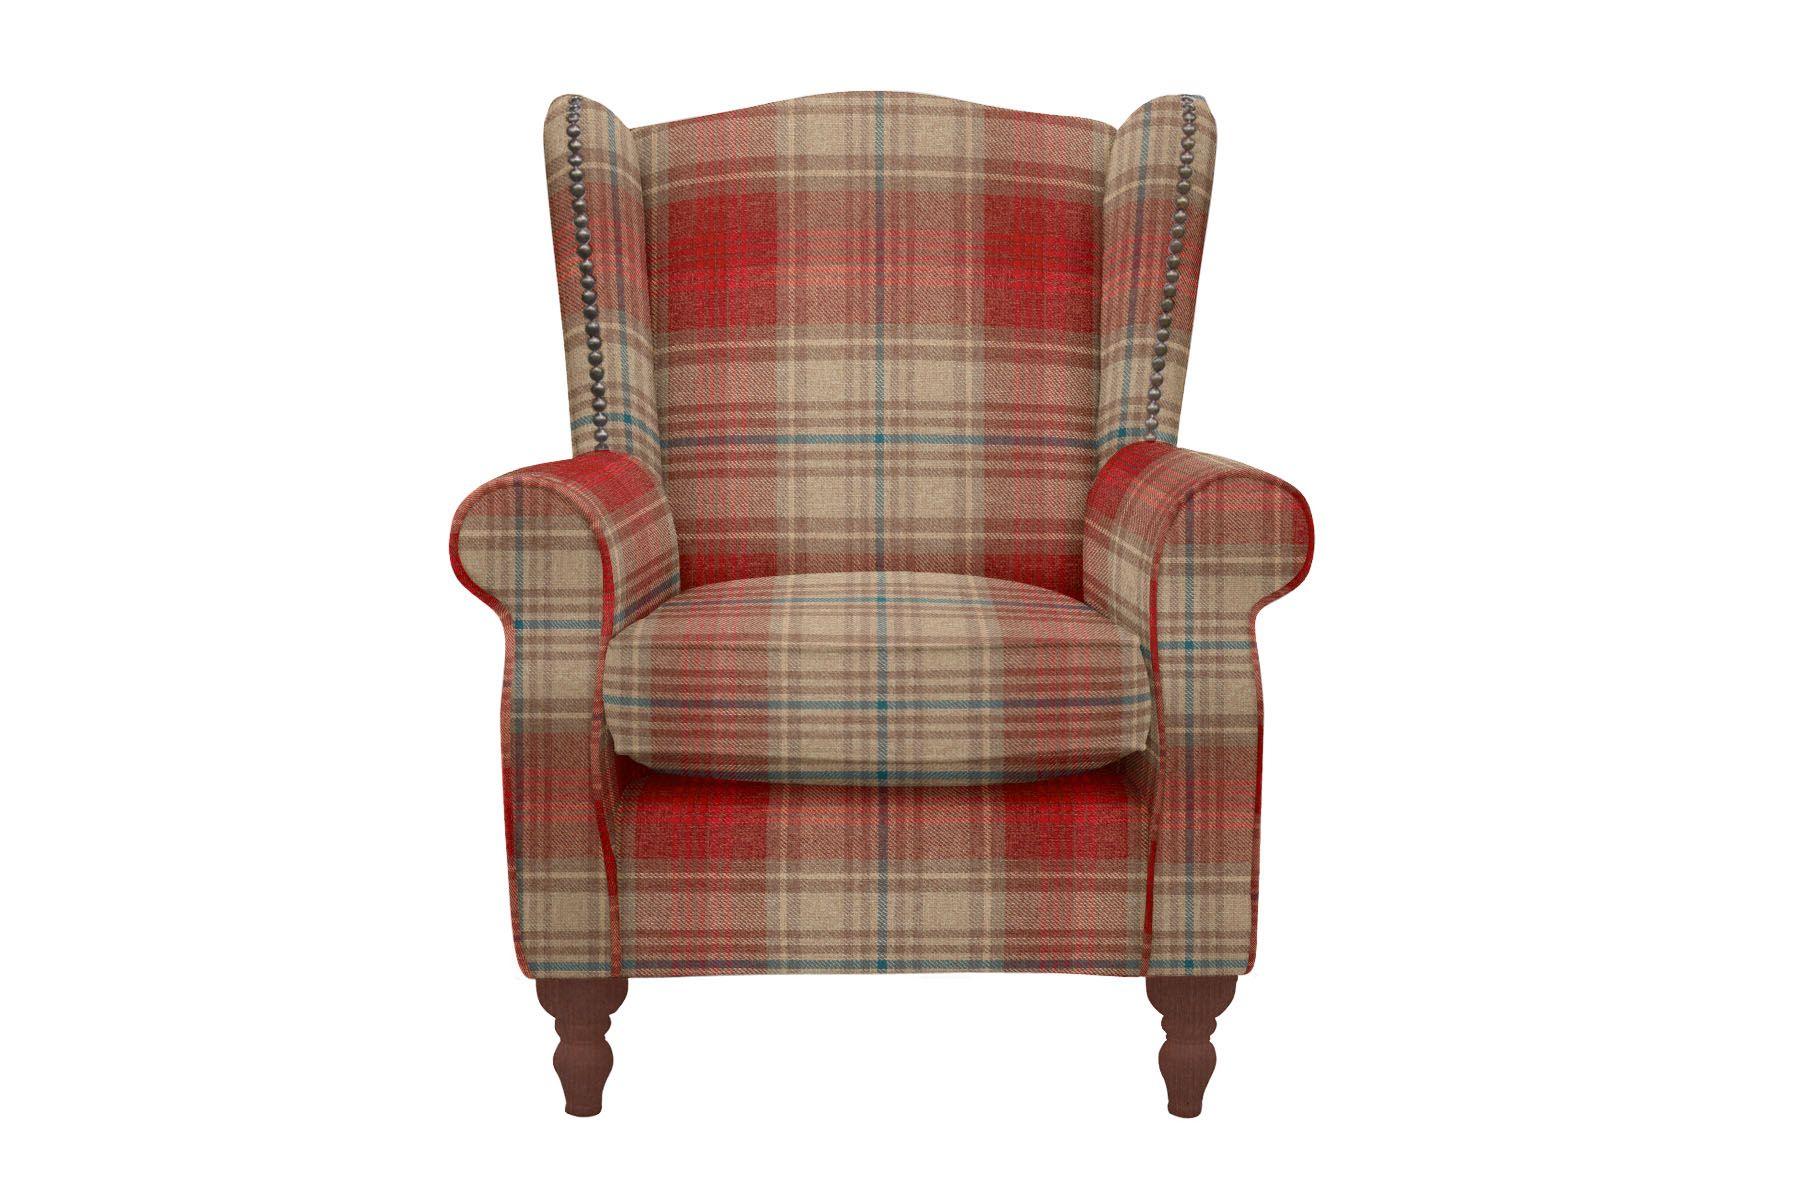 Red Tartan Sherlock Armchair from Next UK Home